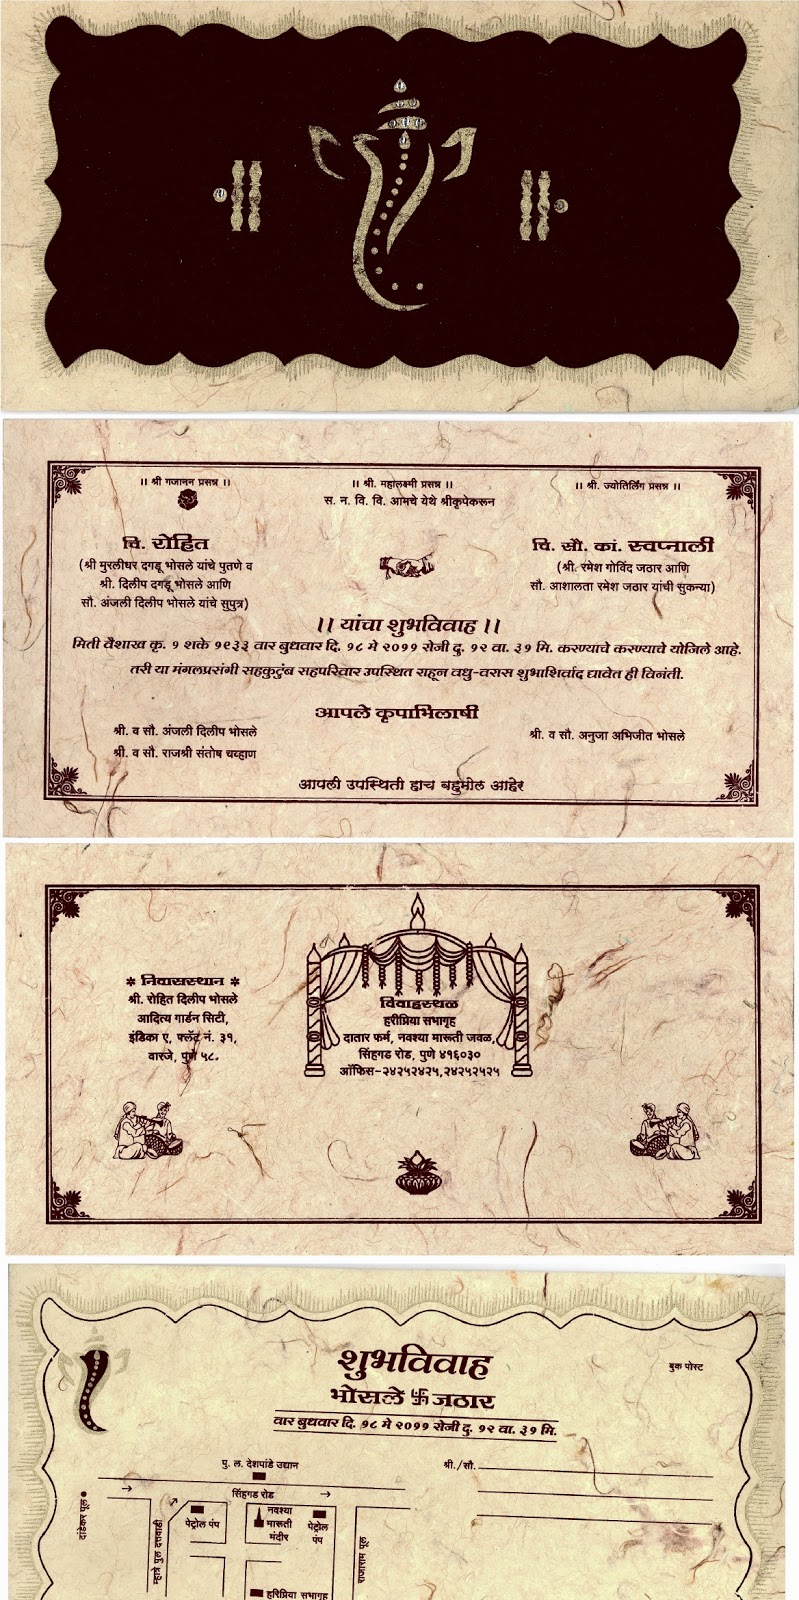 marathi lagna patrika matter marathi lagna patrika majkur marathi ...